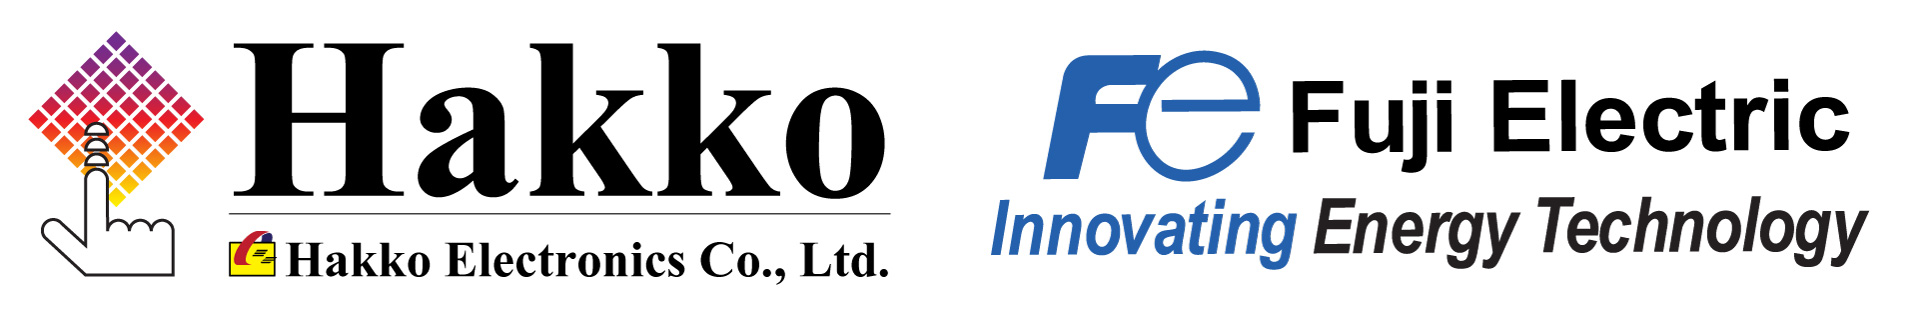 Hakko Software V SFT Fuji Electric